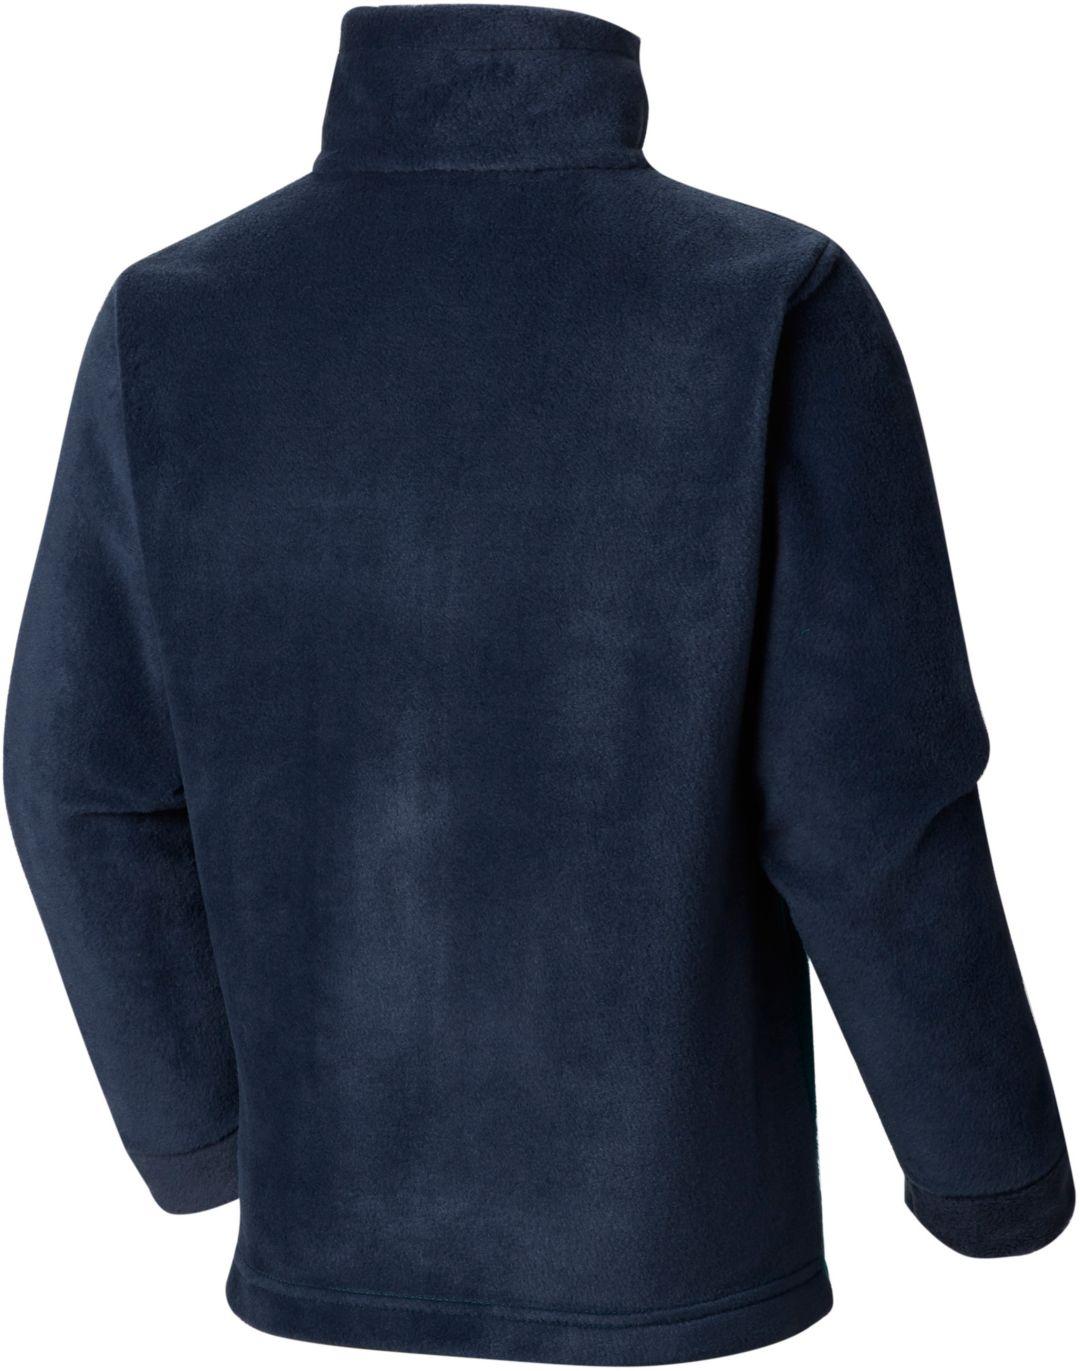 f19d88a91 Columbia Boys' Steens Mountain Fleece Jacket | DICK'S Sporting Goods